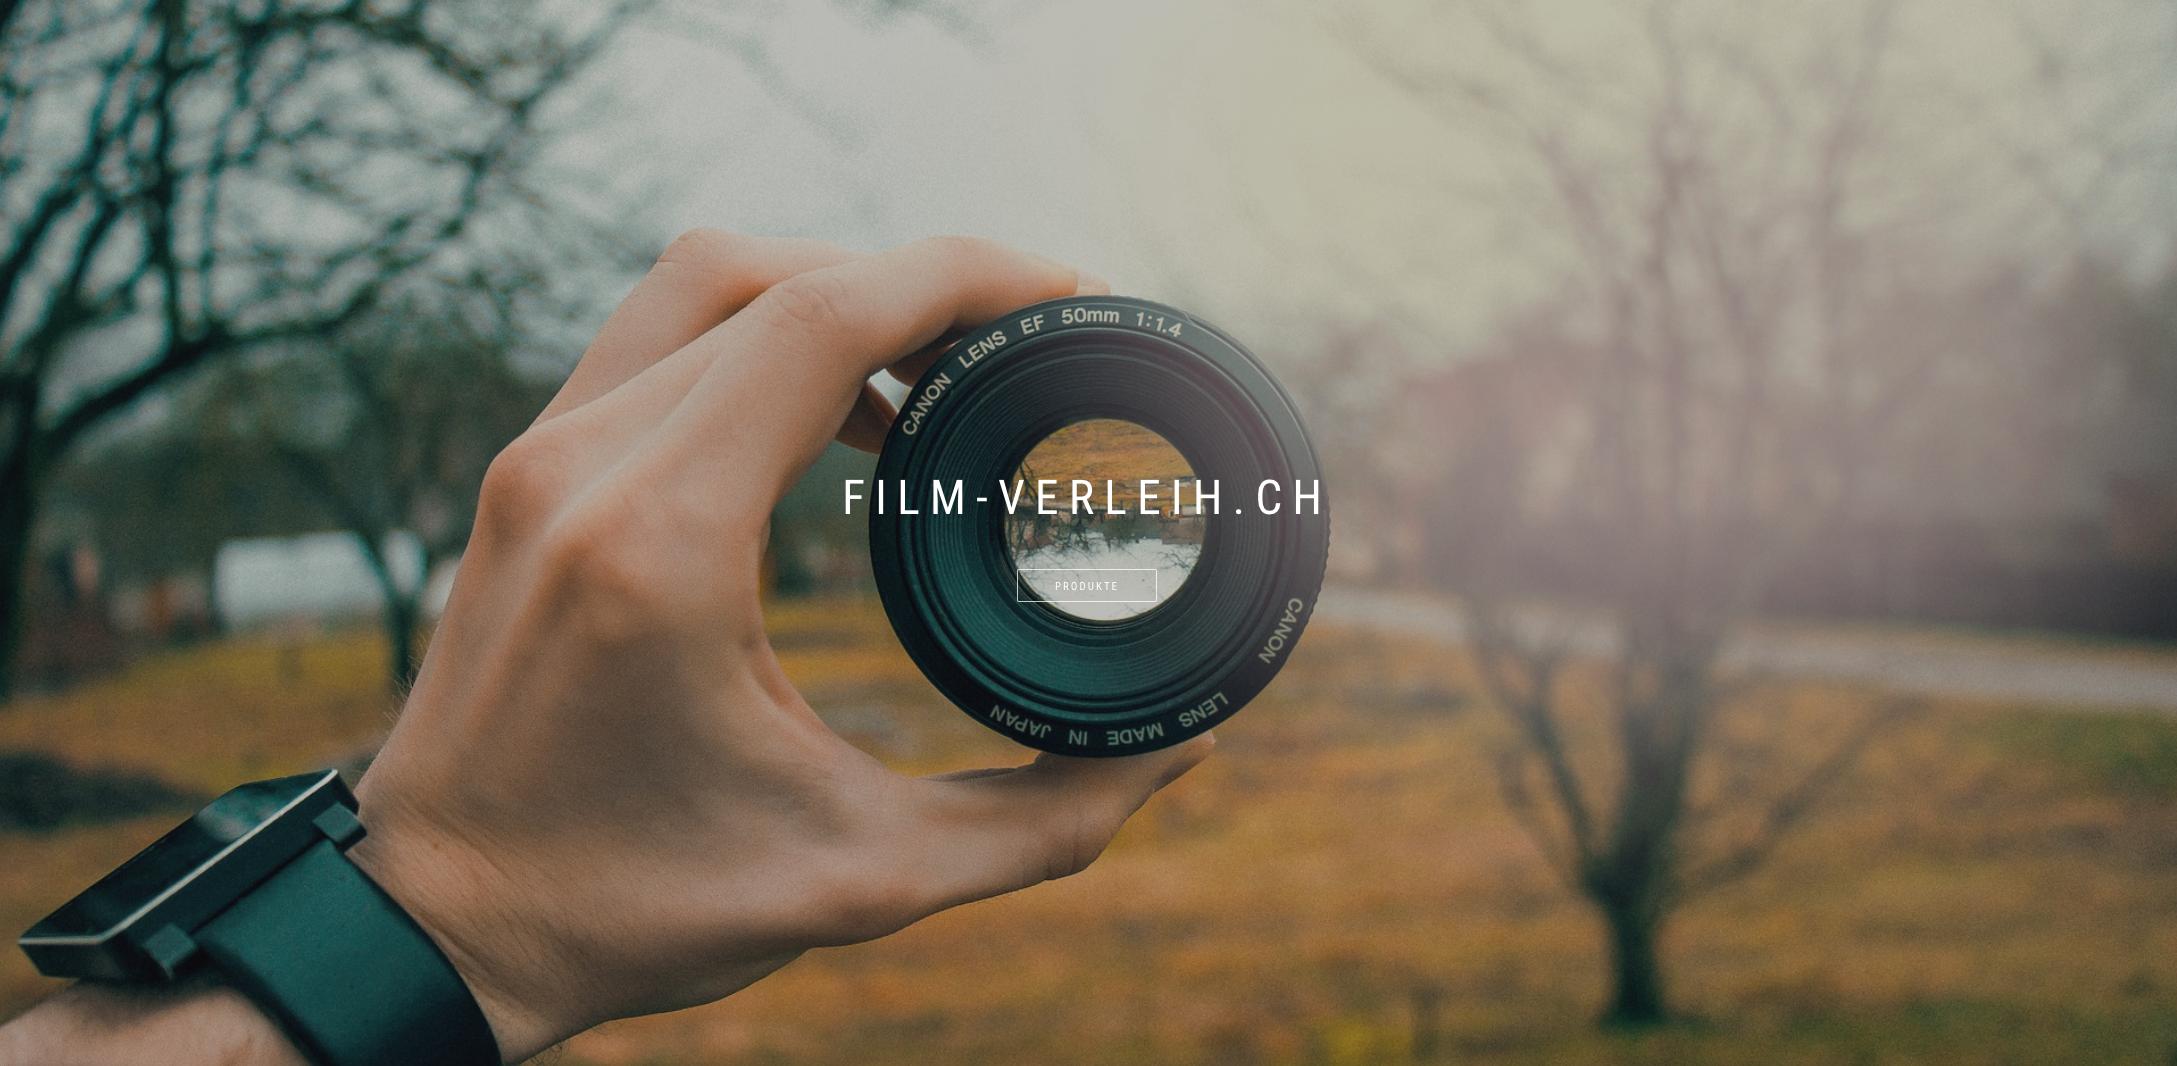 film-verleih.ch